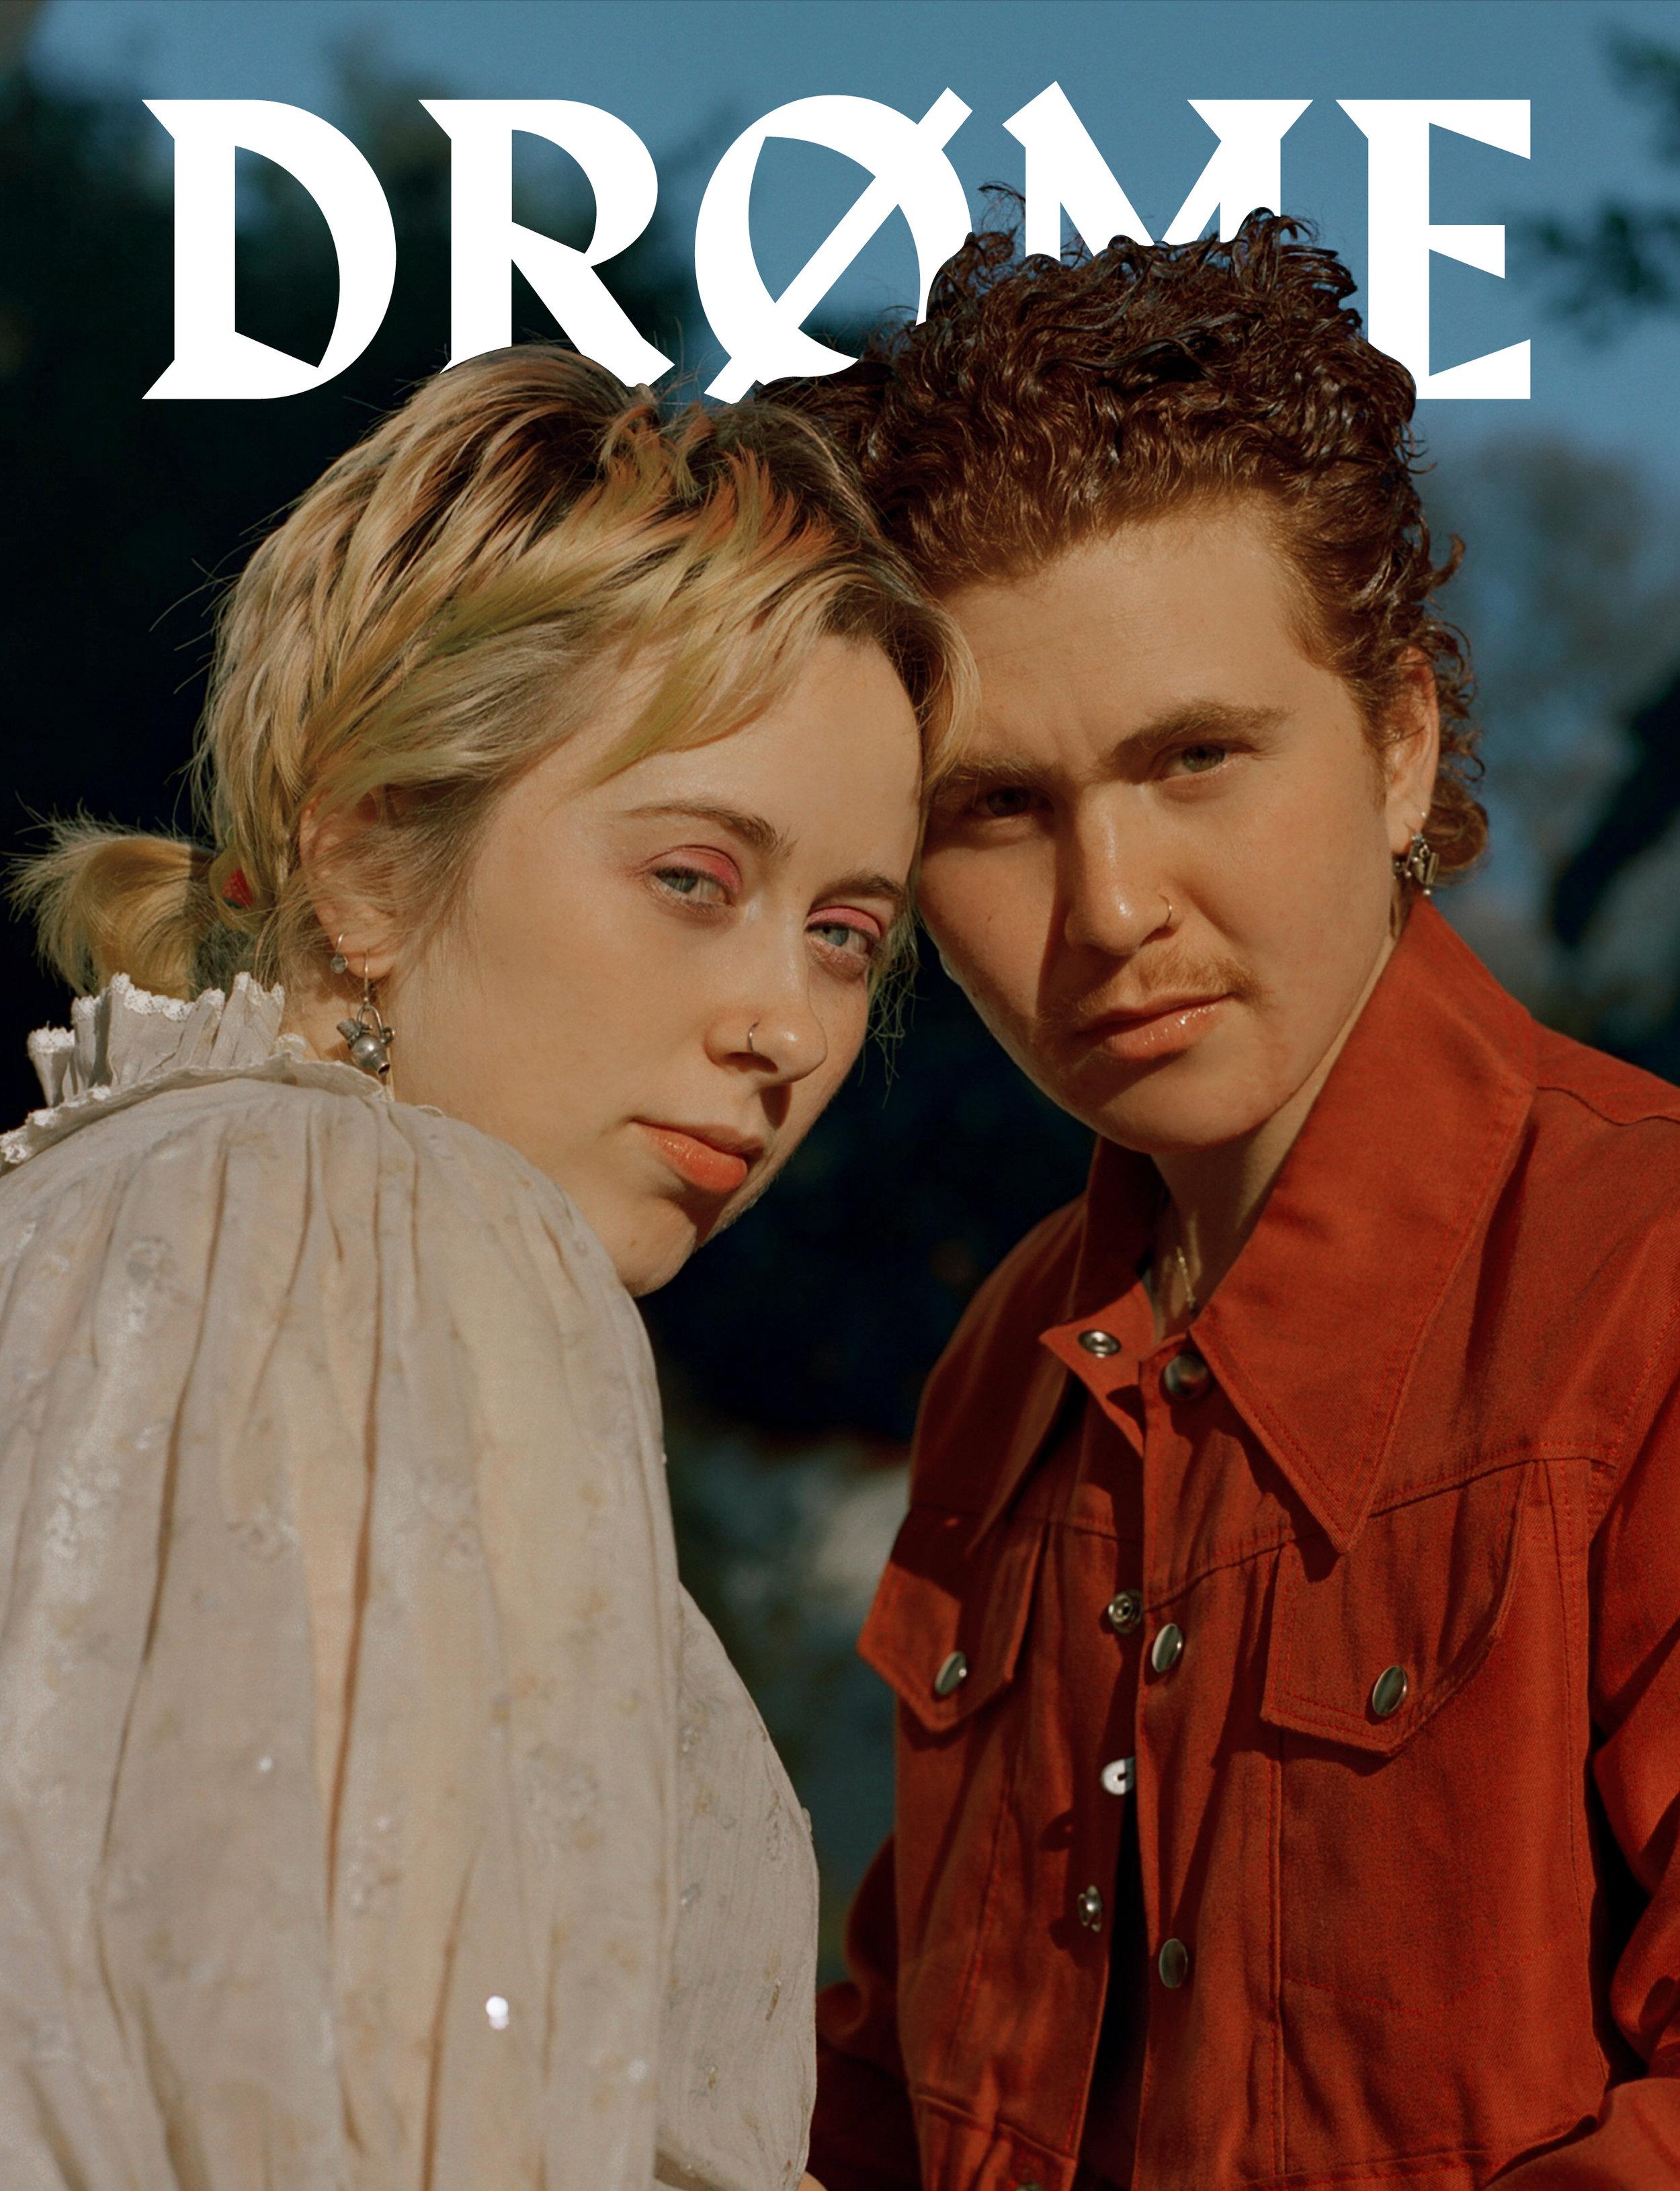 DROME_COVER_APR2019_03.jpg